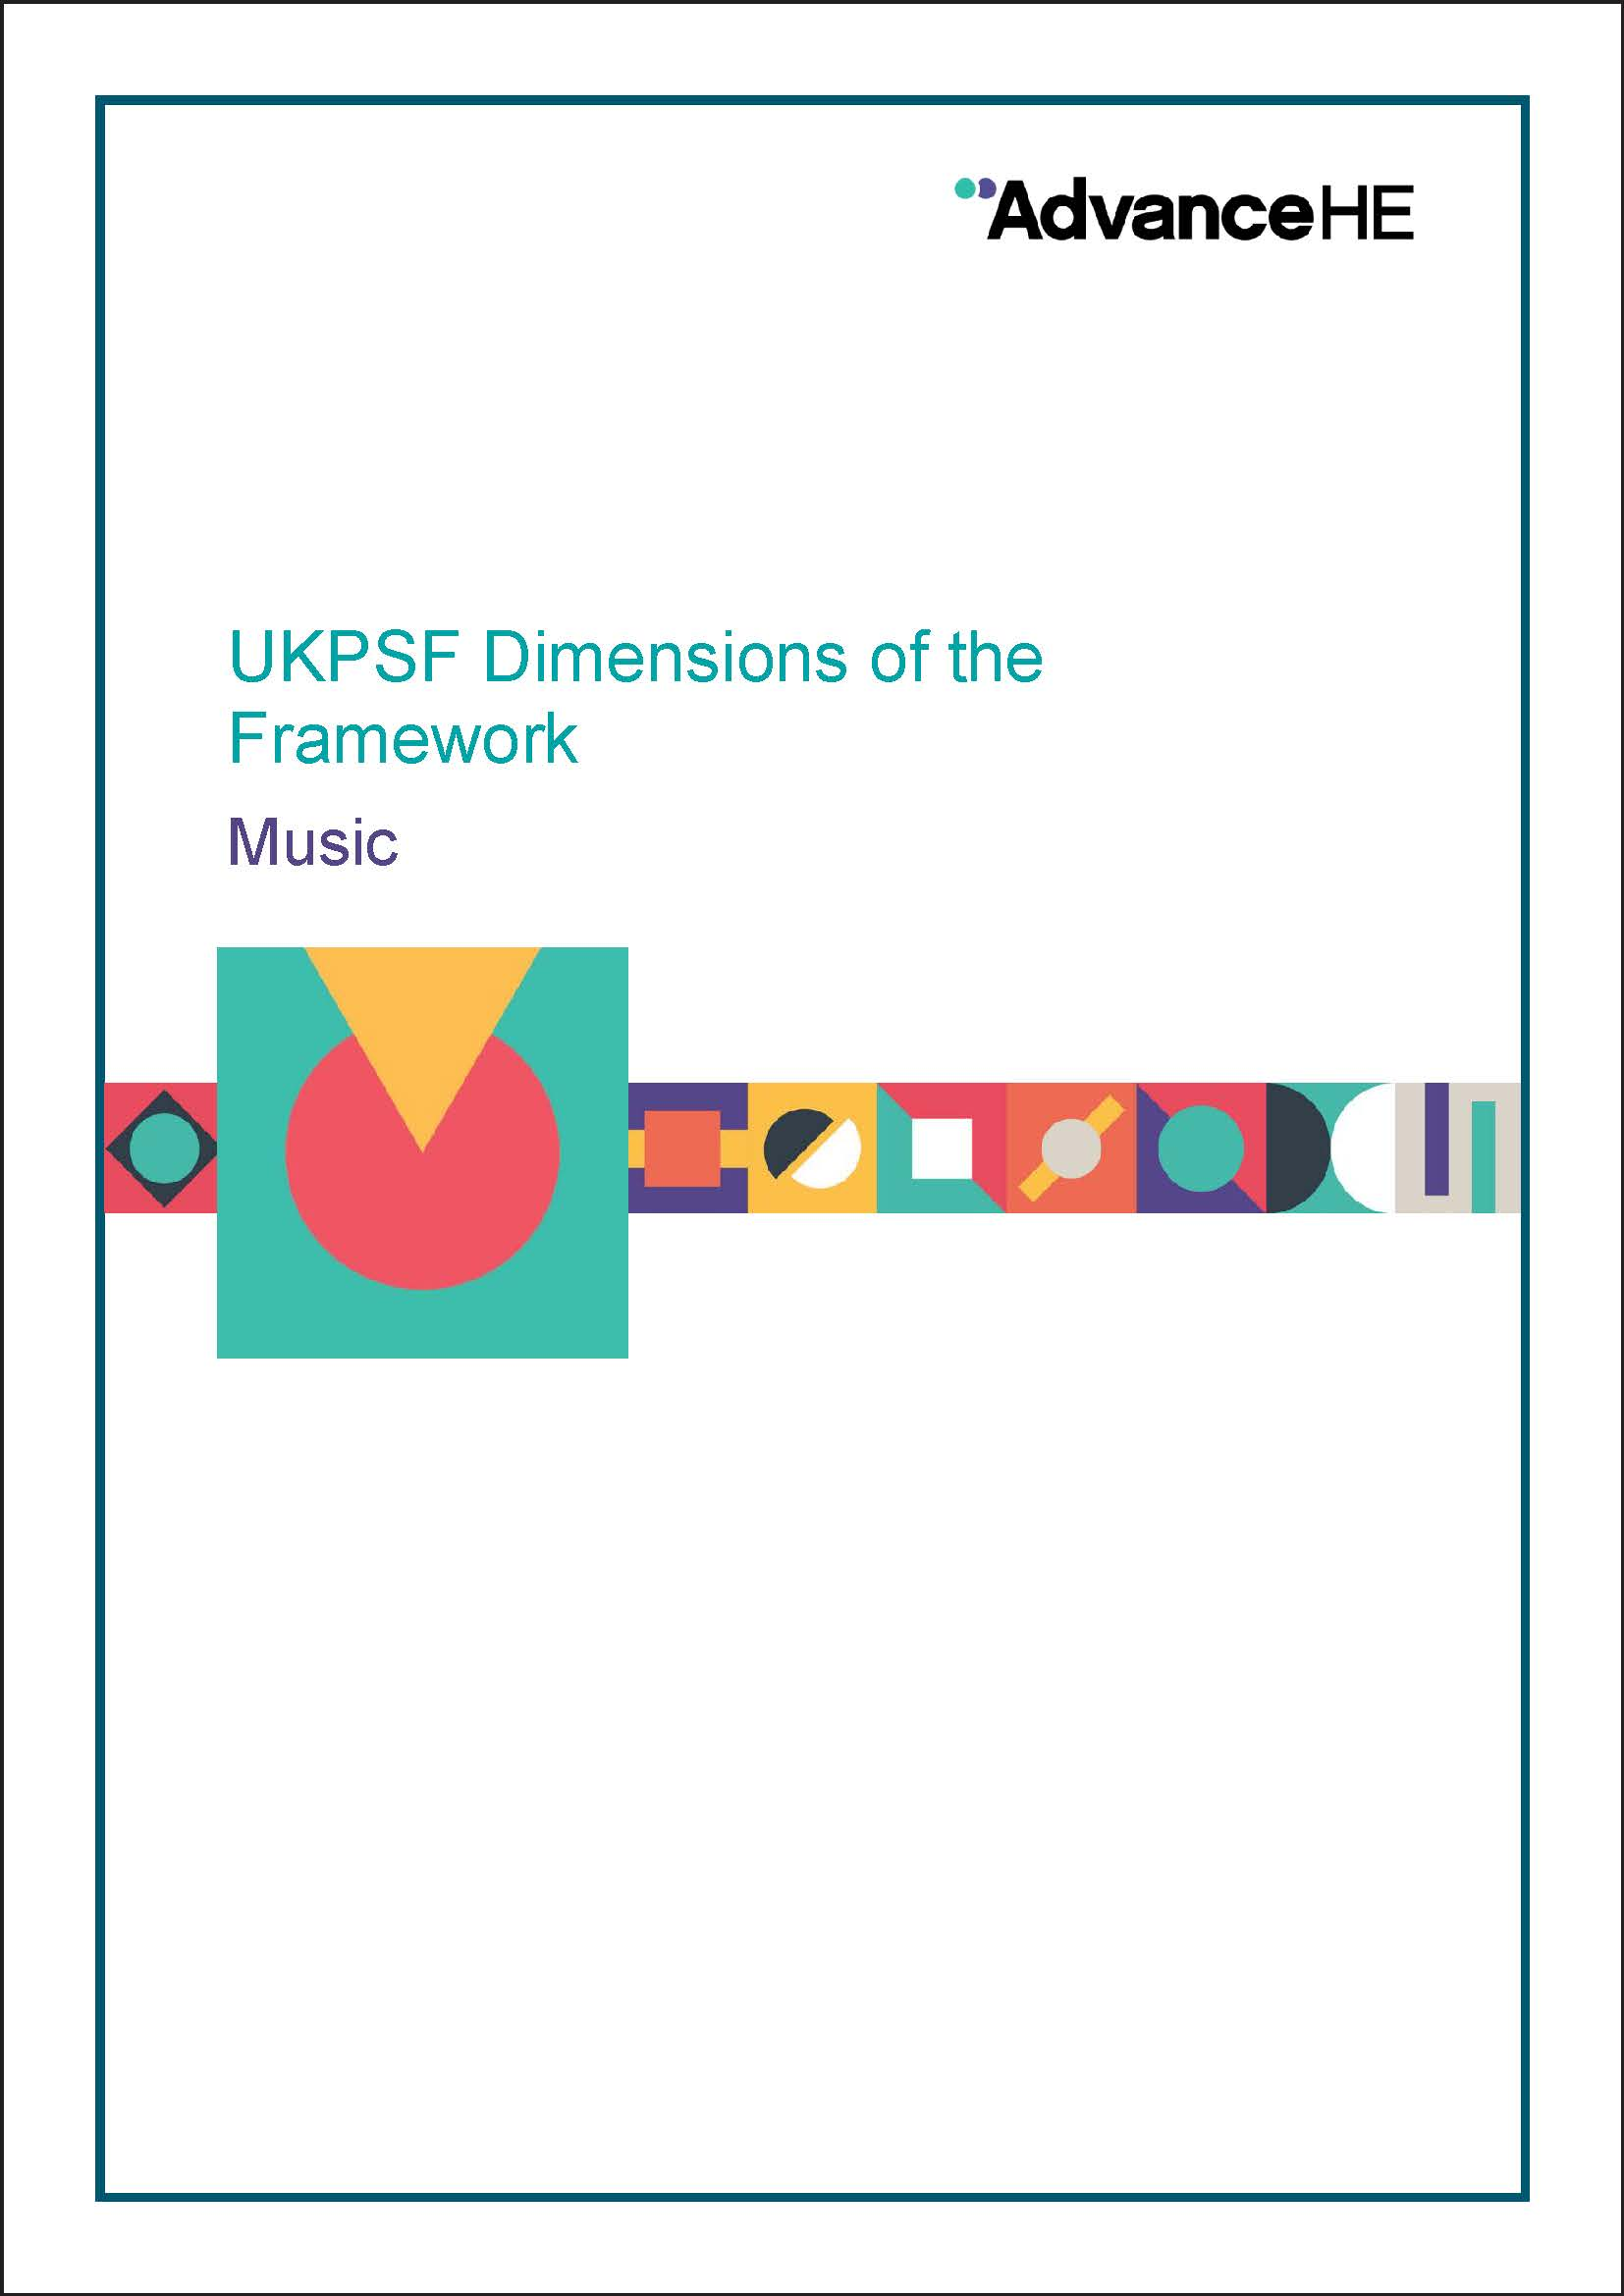 UKPSF Dimensions of the Framework - Music